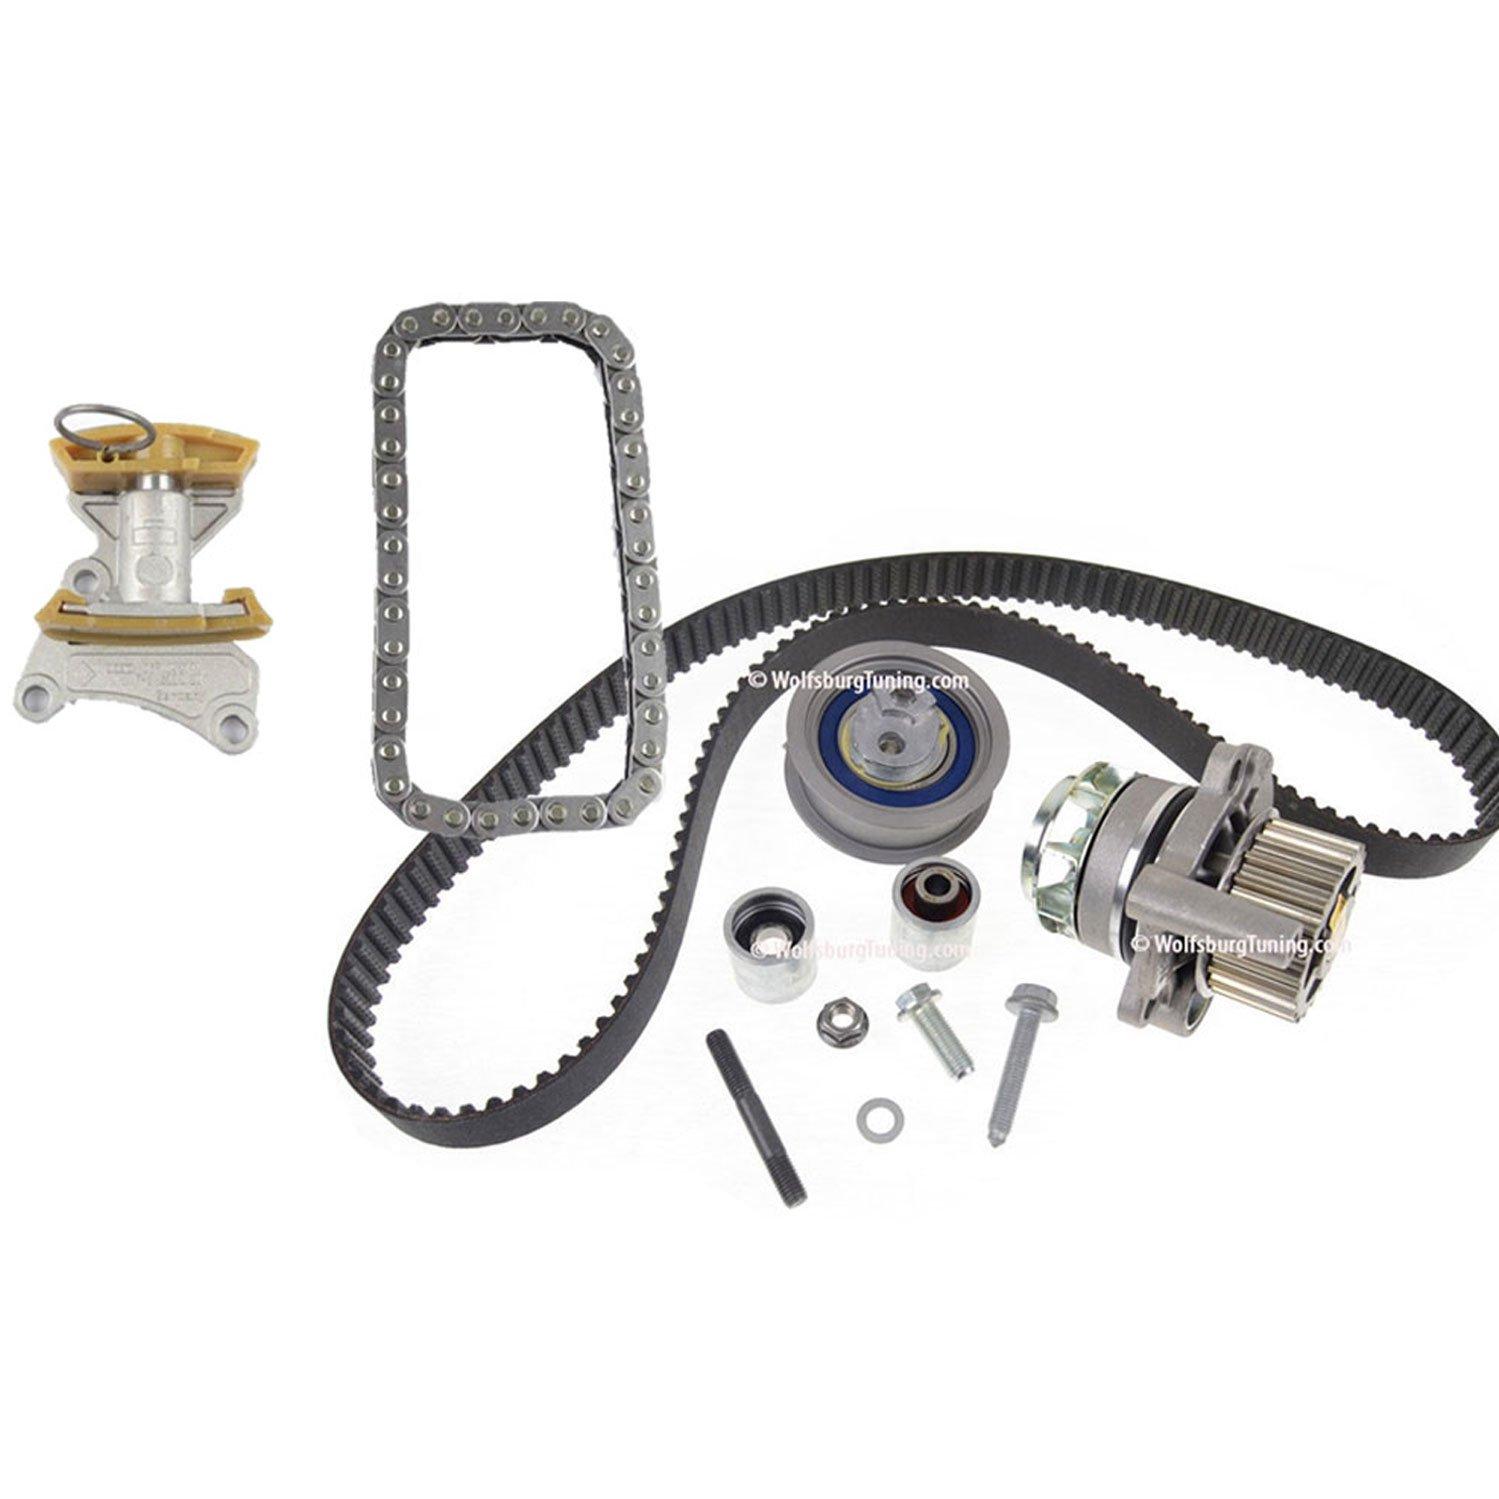 VW EOS, Golf GTI, Jetta y Audi A3 A4 TT Kit de Correa dentada bomba de agua cadena 2.0 T 2.0T BPY FSI 06 - 08: Amazon.es: Coche y moto